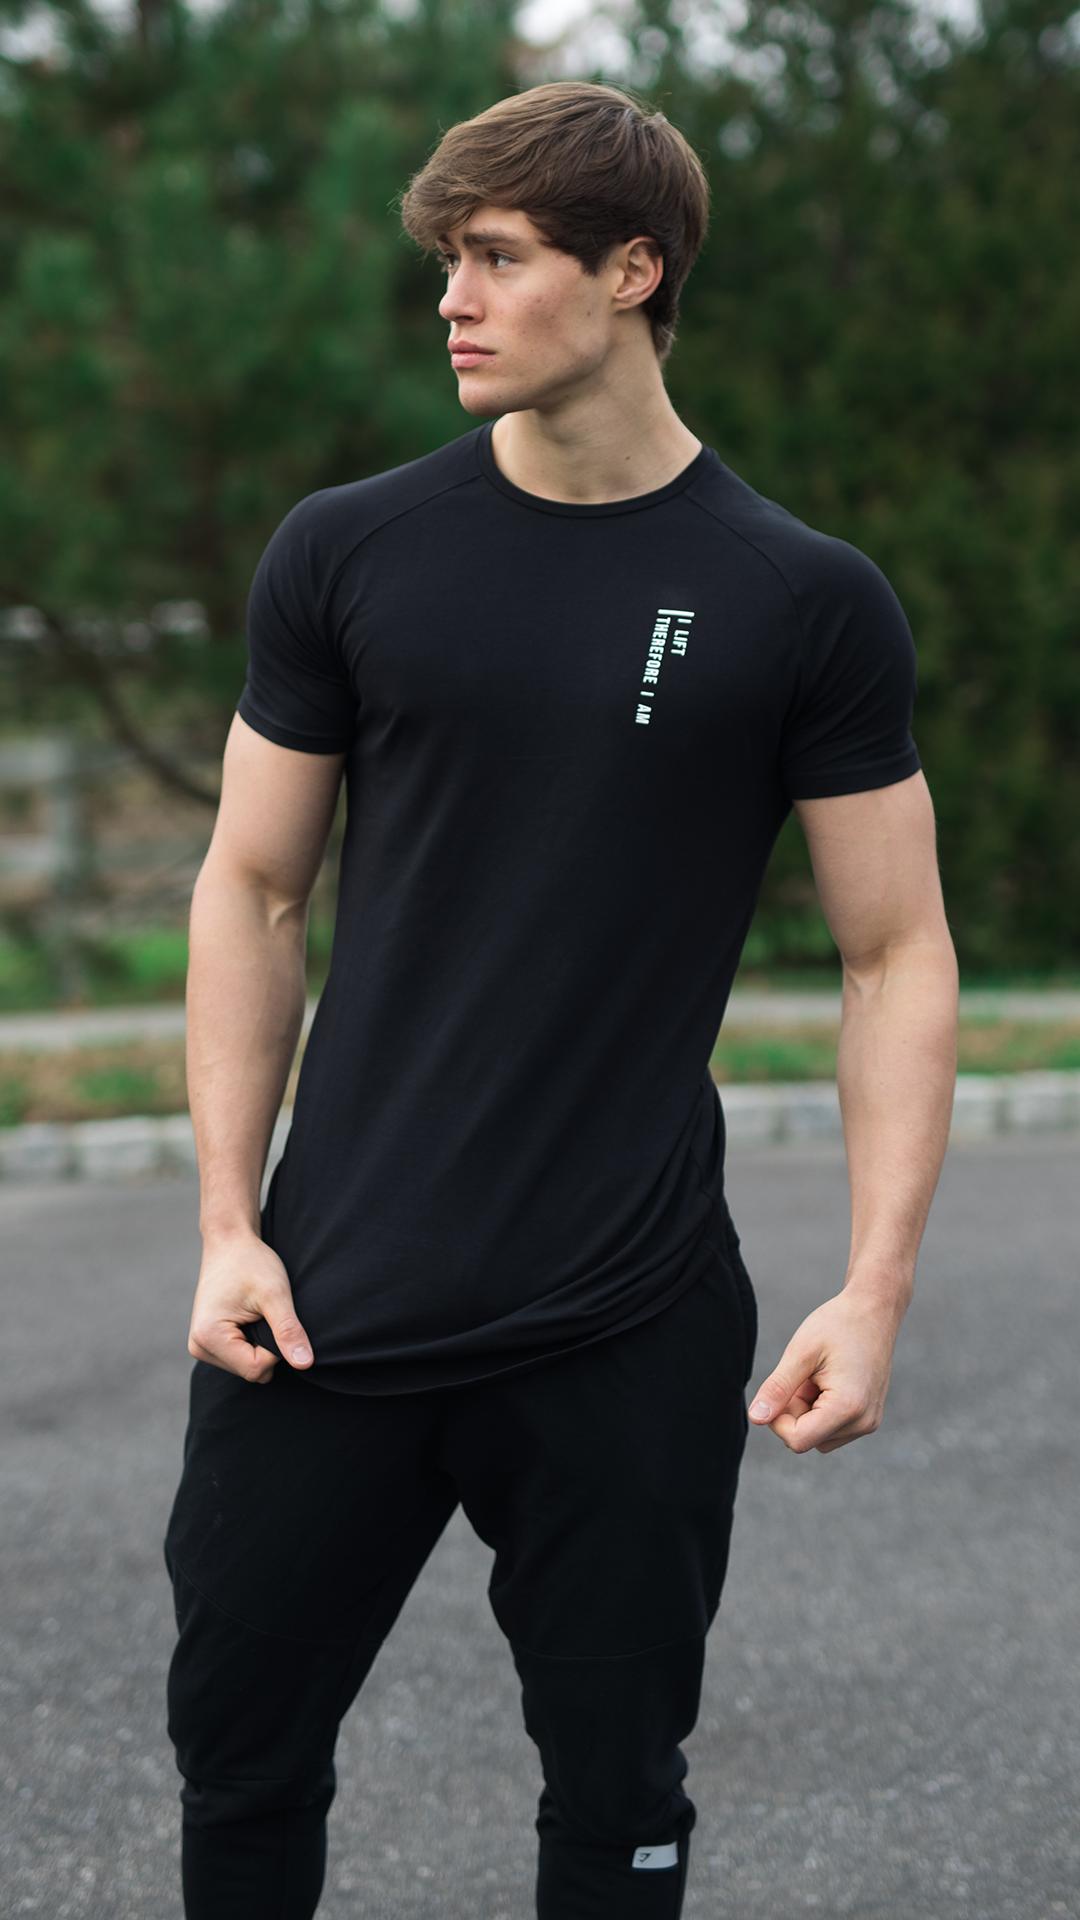 Stay hungry mens t shirt mens workout shirt bodybuilding gym t-shirt cool men t shirt mens exercise shirts mens fitness shirt